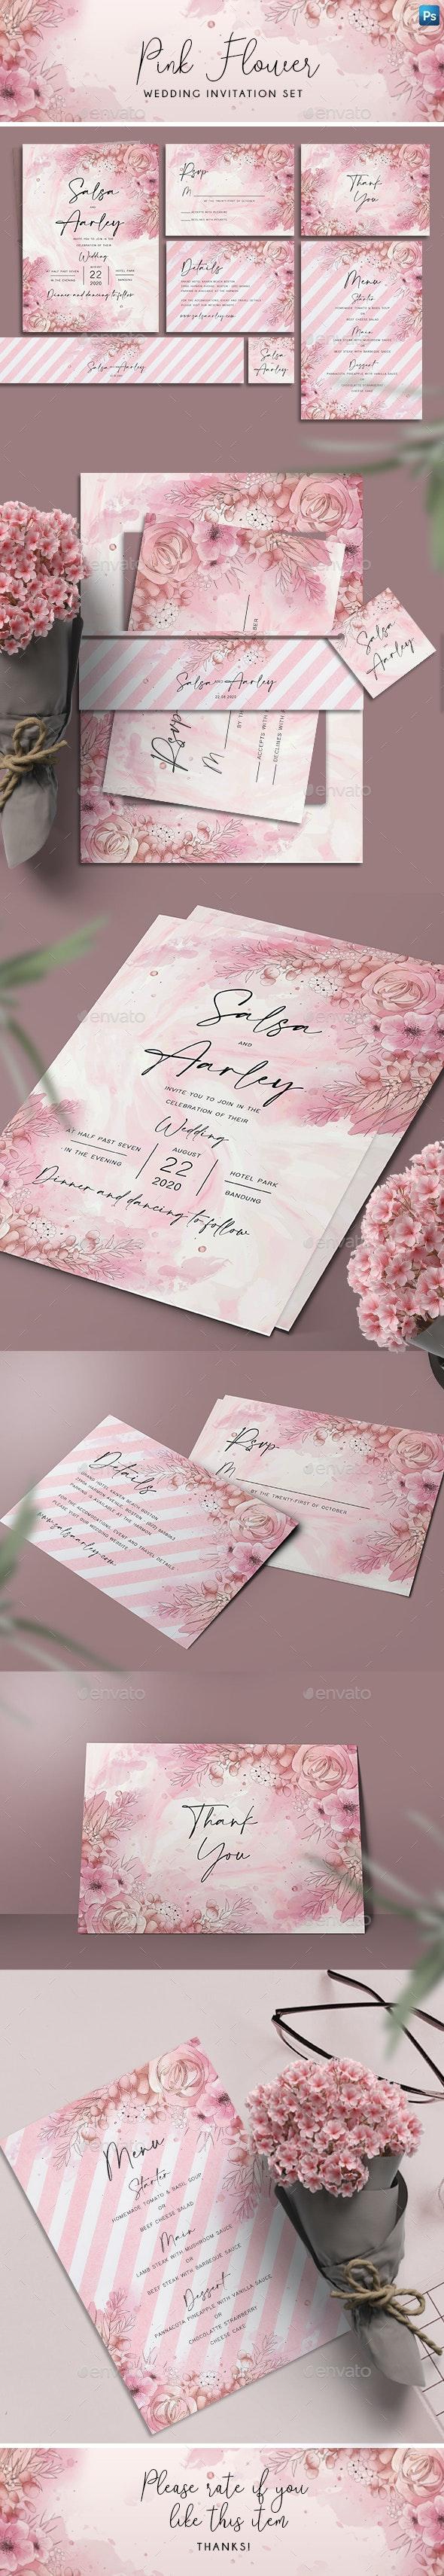 Pink Flower Wedding Invitation Set - Weddings Cards & Invites